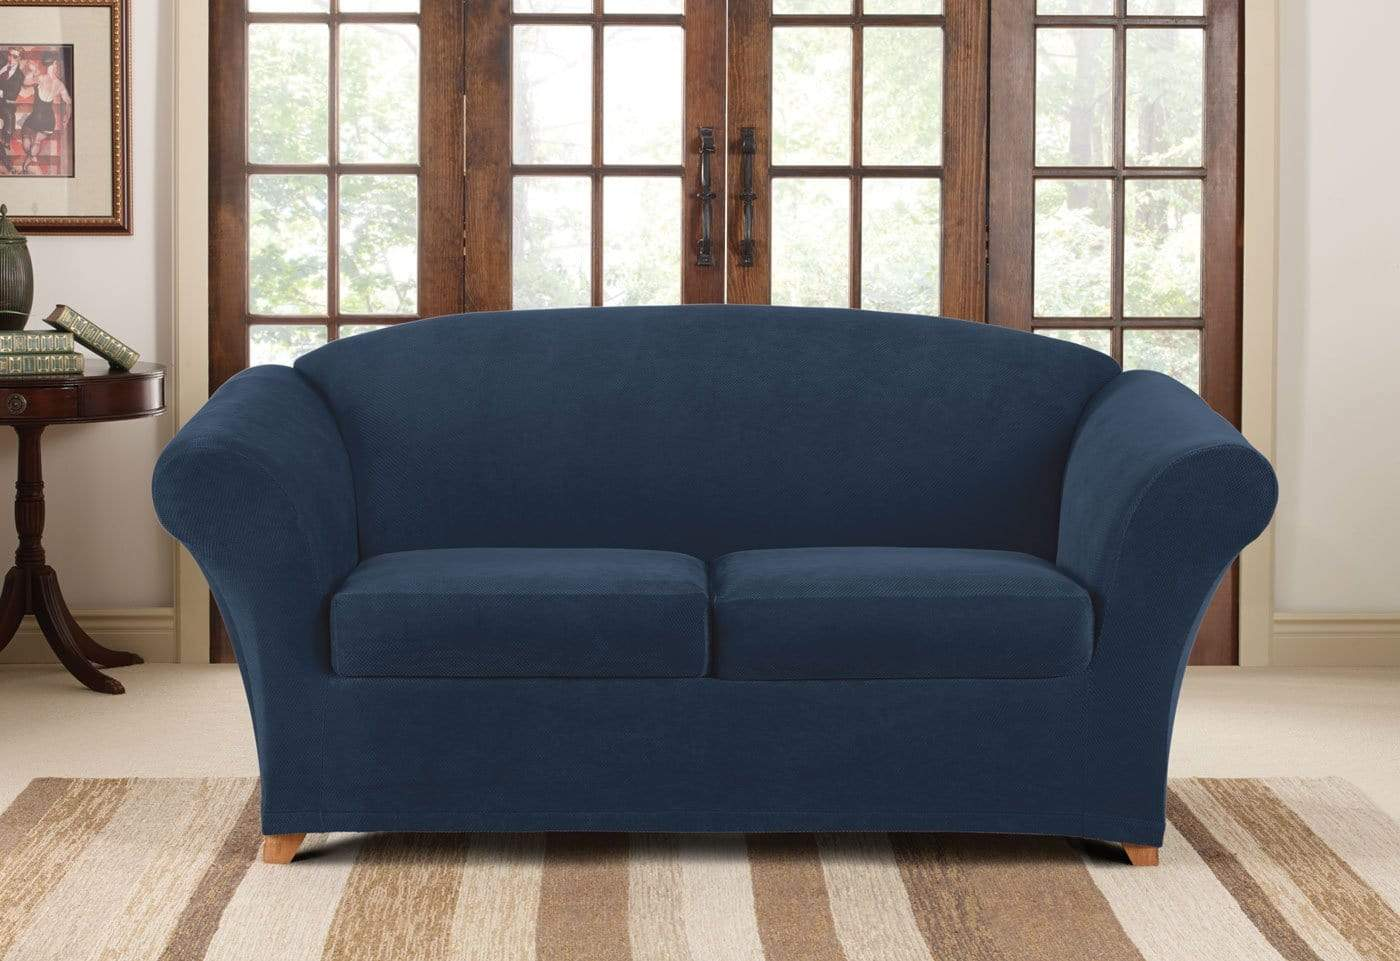 sure fit stretch pique 3 piece t cushion sofa slipcover full grain leather recliner three loveseat surefit